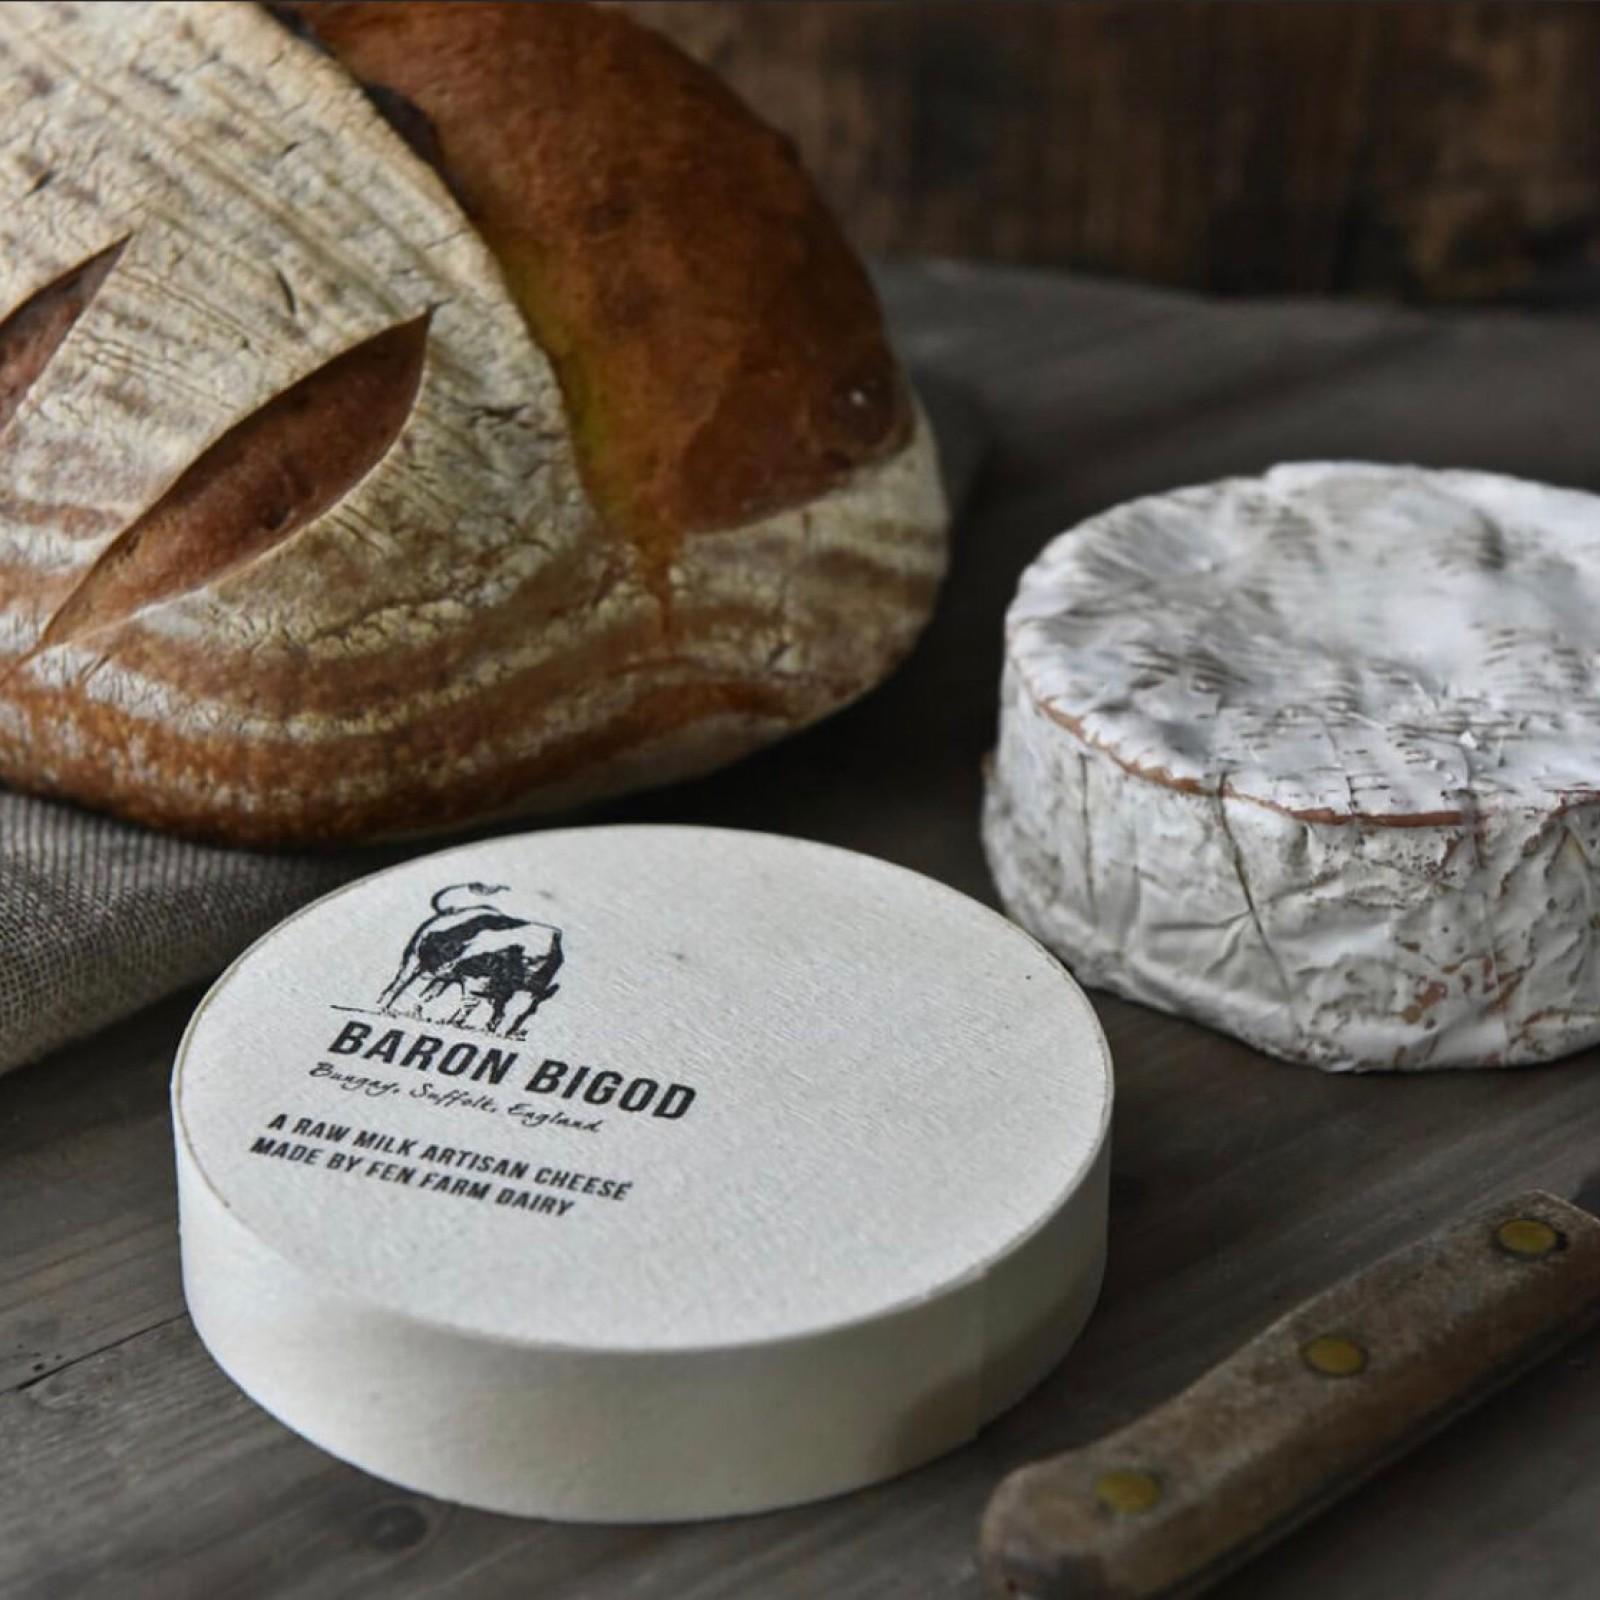 Baron Bigod 250g - Raw milk artisan cheese Brie Style